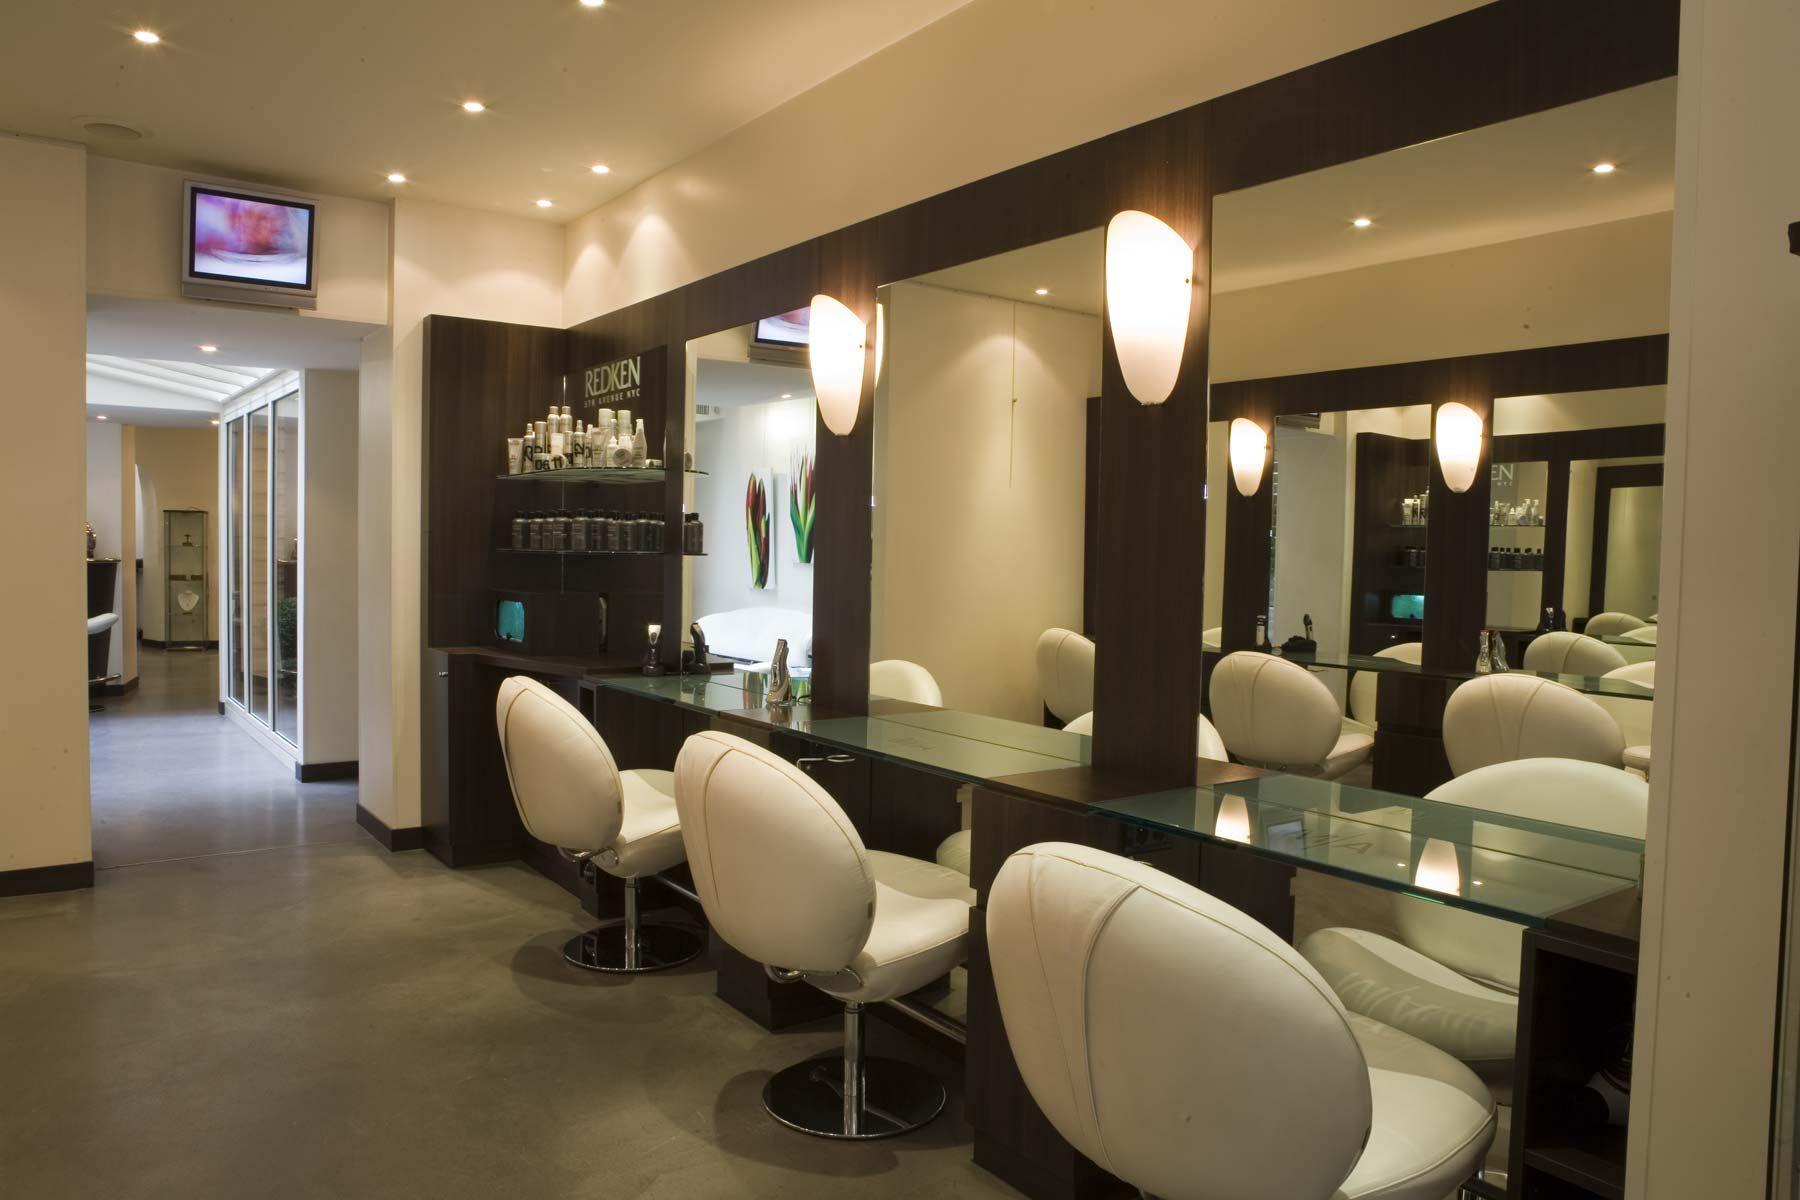 bg_index.jpg (1800×1200) | Hair salon | Pinterest | Salons and ...